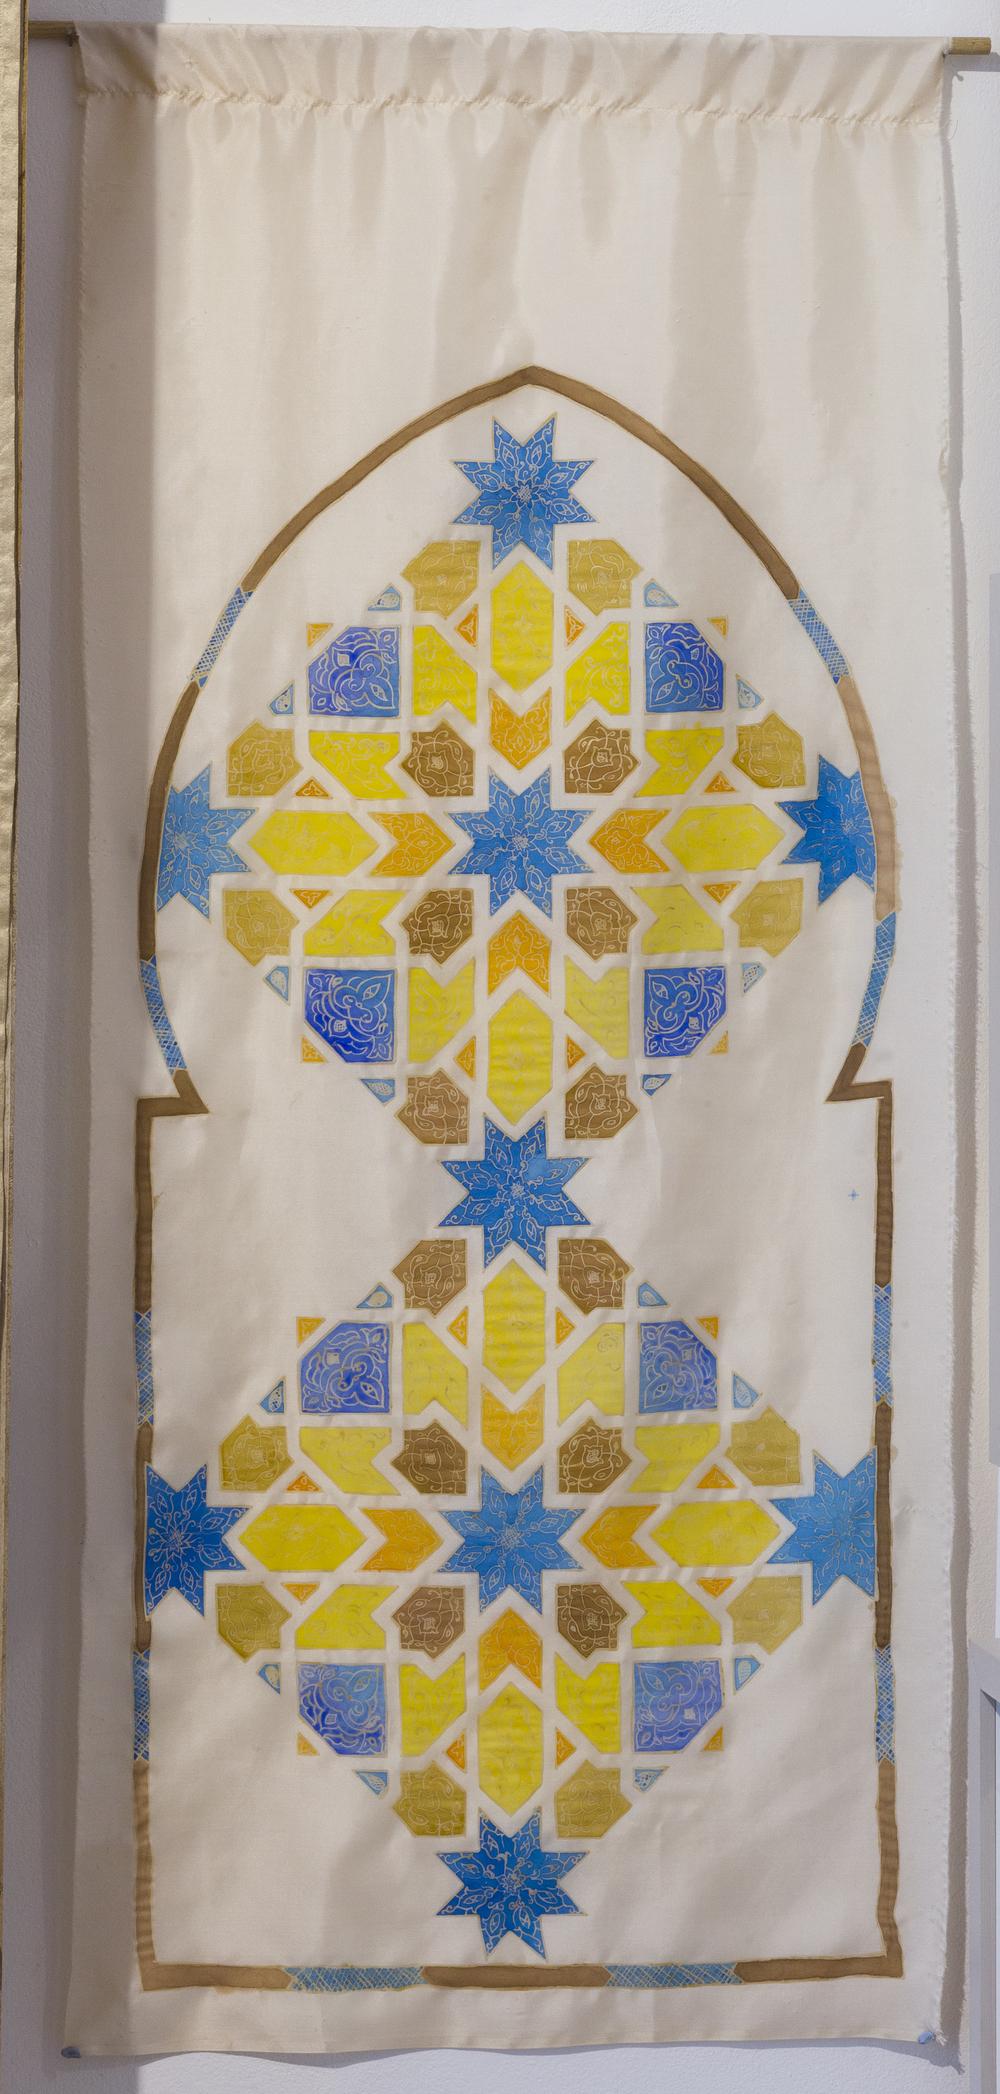 Qarawiyyin silk painted hanging ~ Islamic Art, Moroccan Art, Textile Art, Pattern Design, Shaheen Kasmani